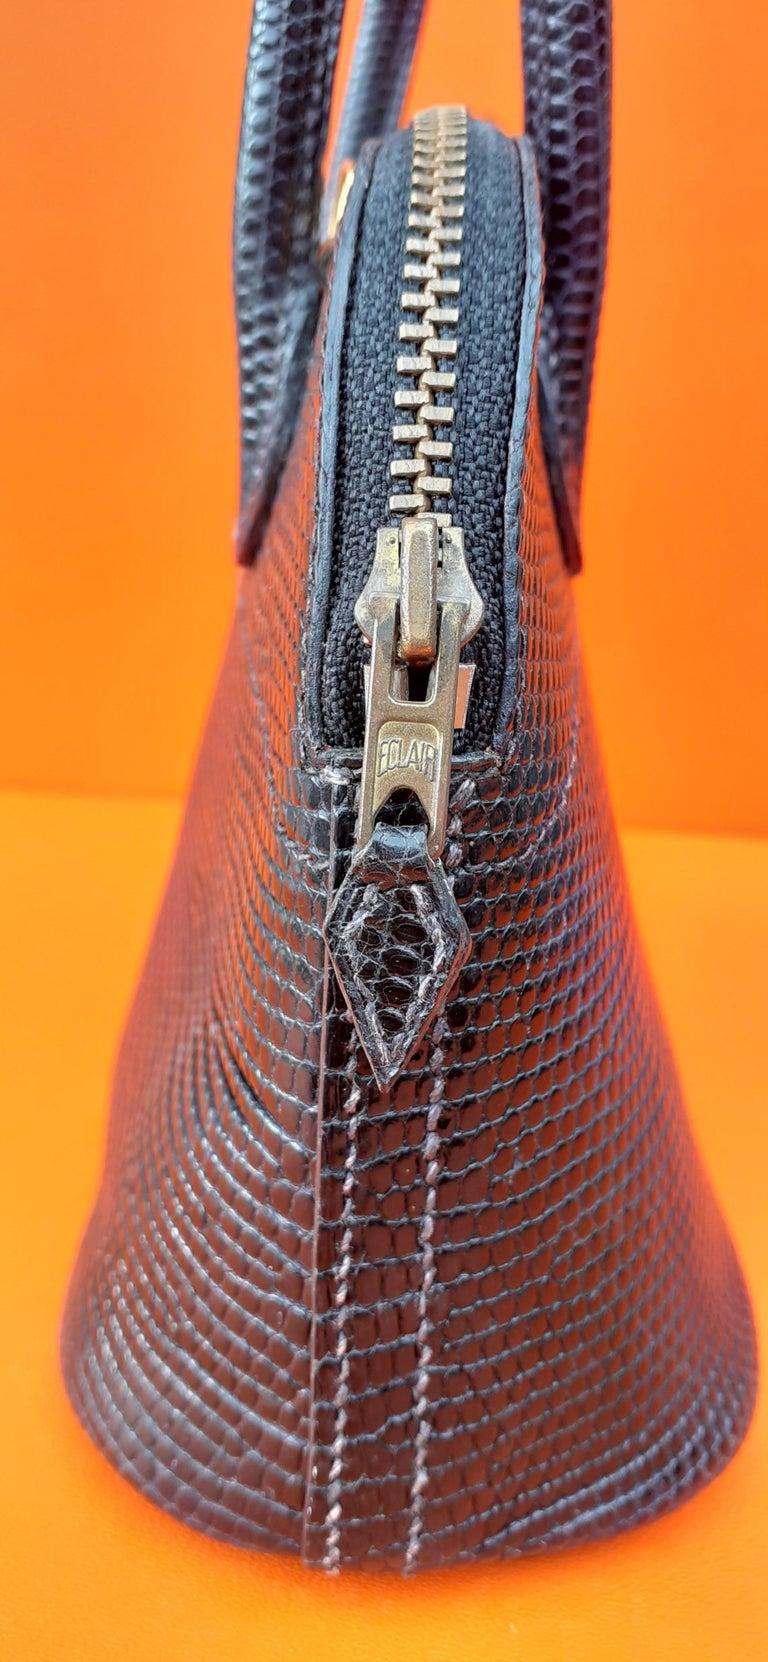 Exceptional Hermès Micro Bolide Bag Black Lizard Golden Hdw 16 cm RARE For Sale 7